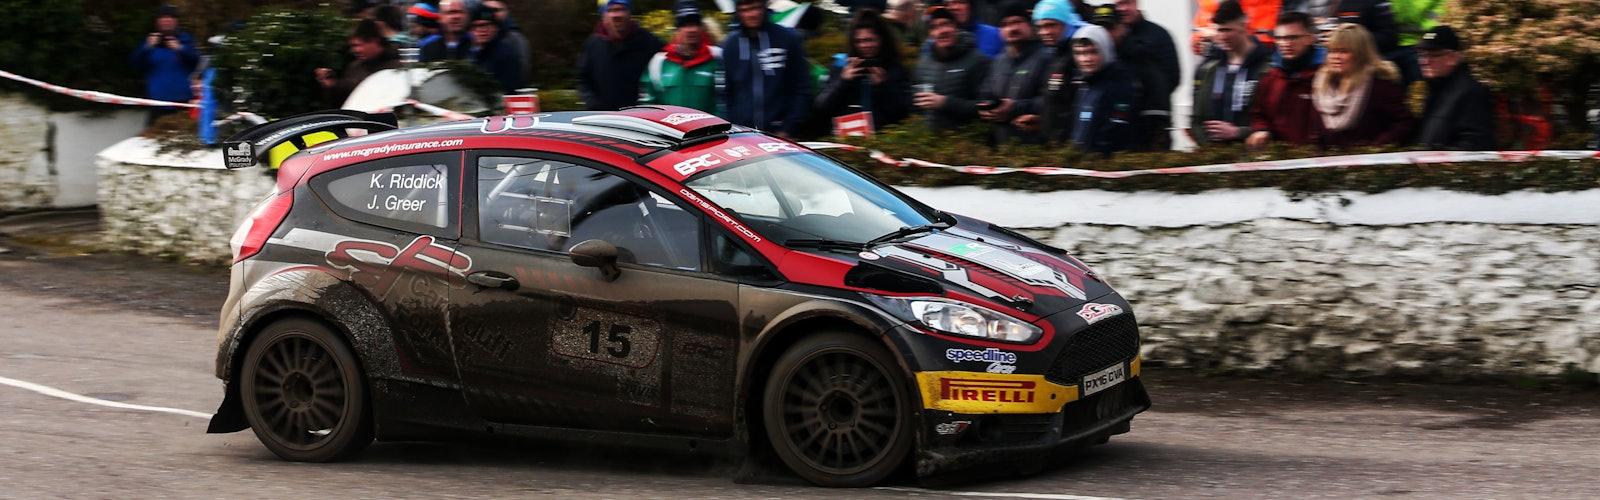 Jonny Greer / Kirsty Riddick Ford Fiesta R5